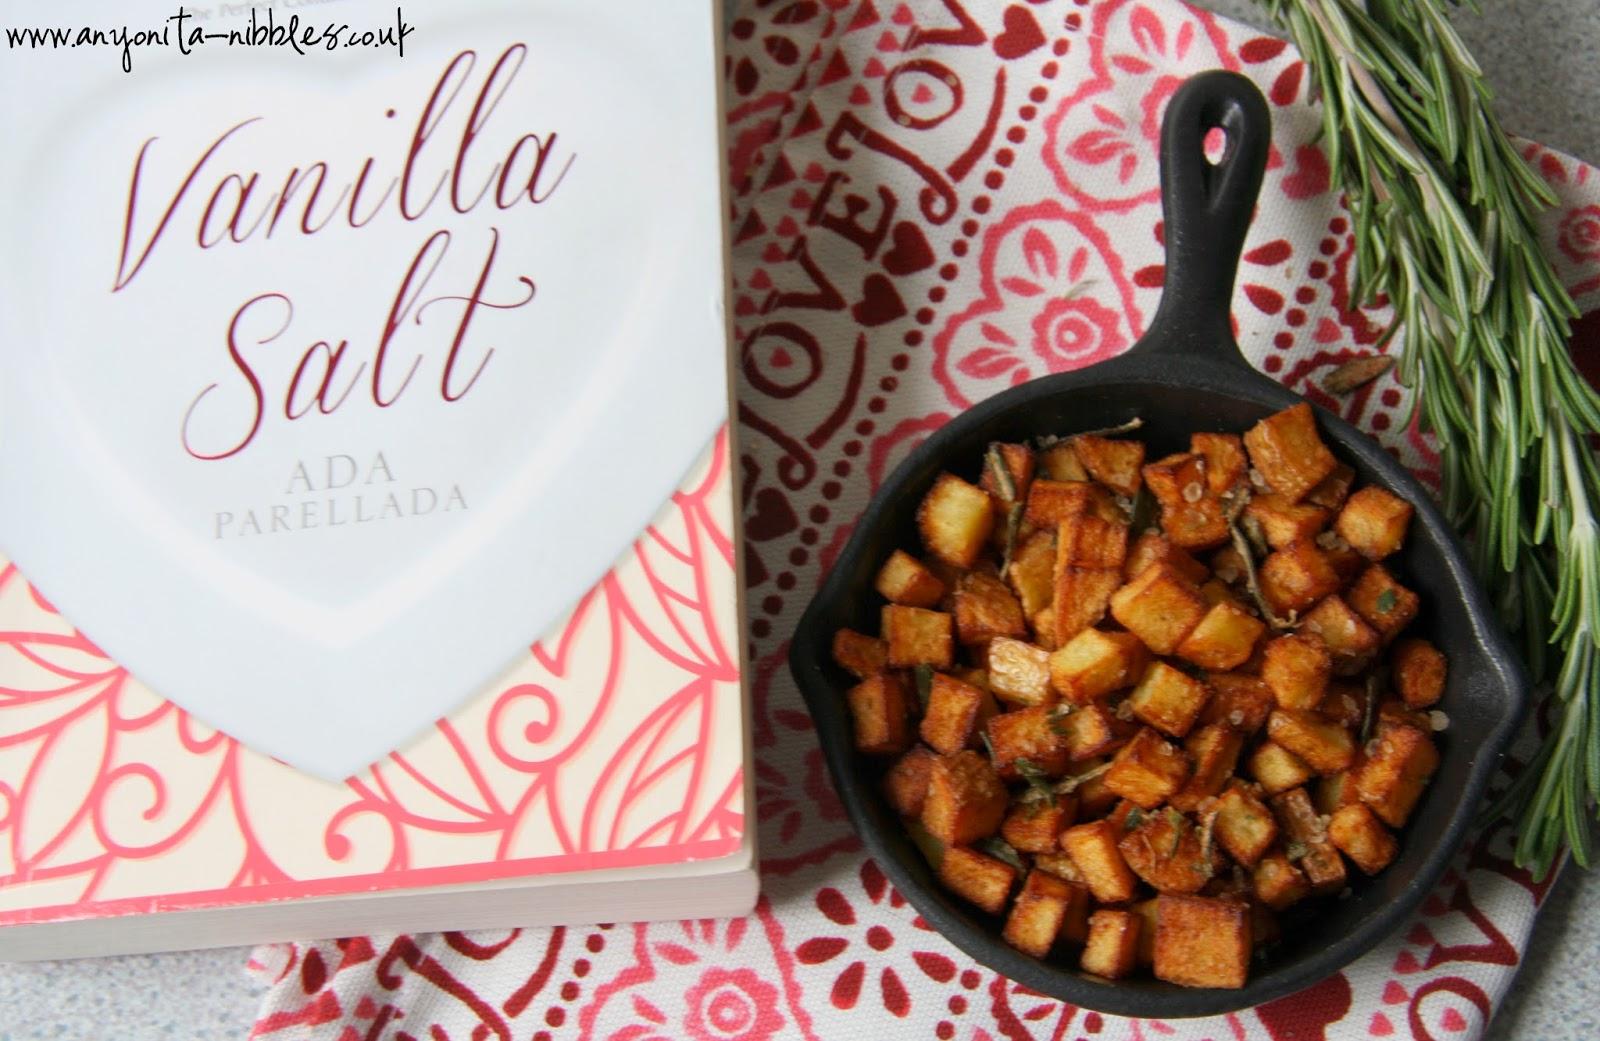 Vanilla Salt by Ada Parellada and rosemary breakfast potatoes from Anyonita Nibbles #book